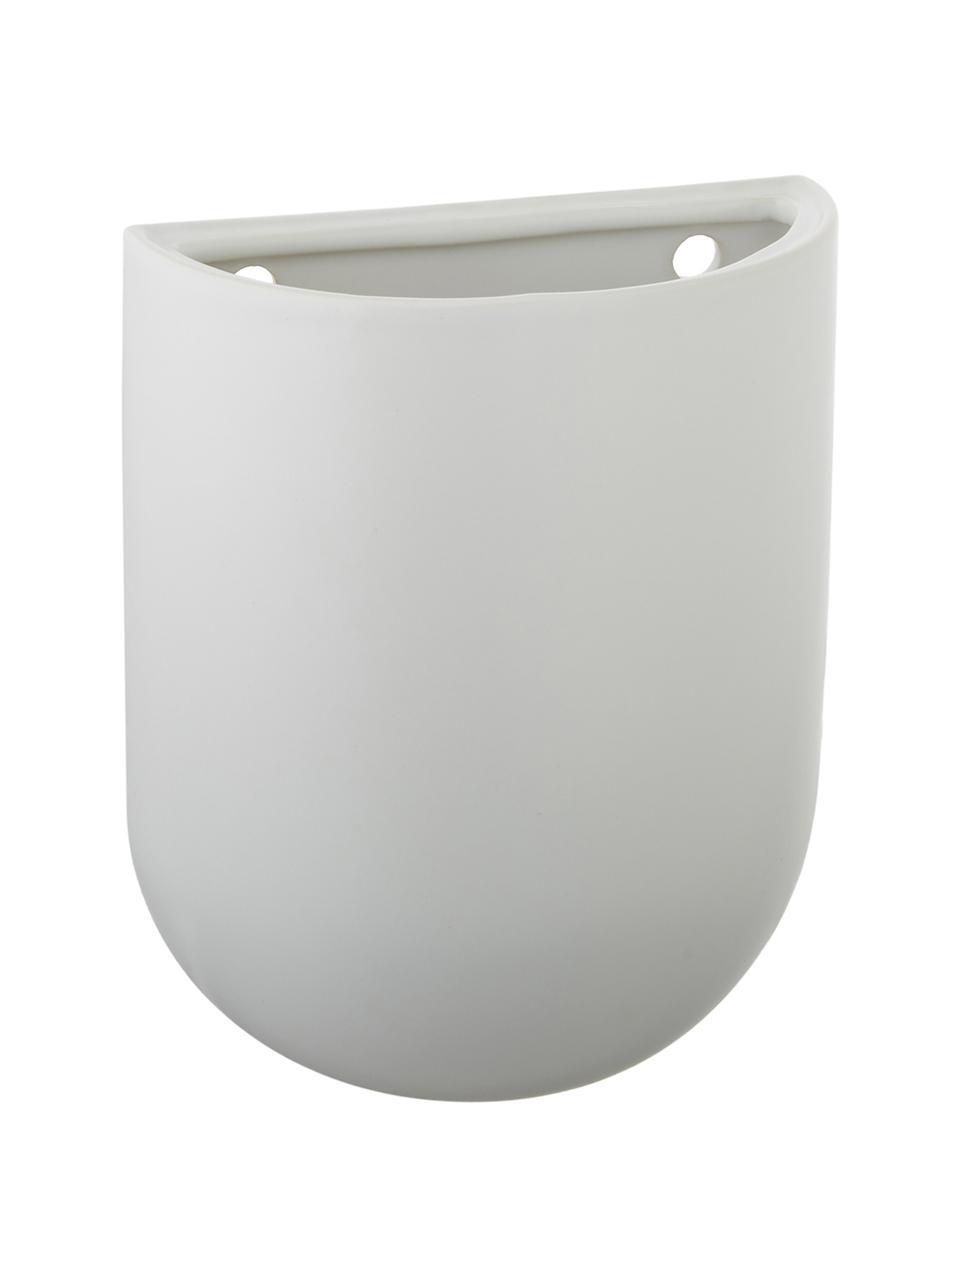 Wand-Übertopf Oval aus Keramik, Keramik, Weiß, 15 x 19 cm